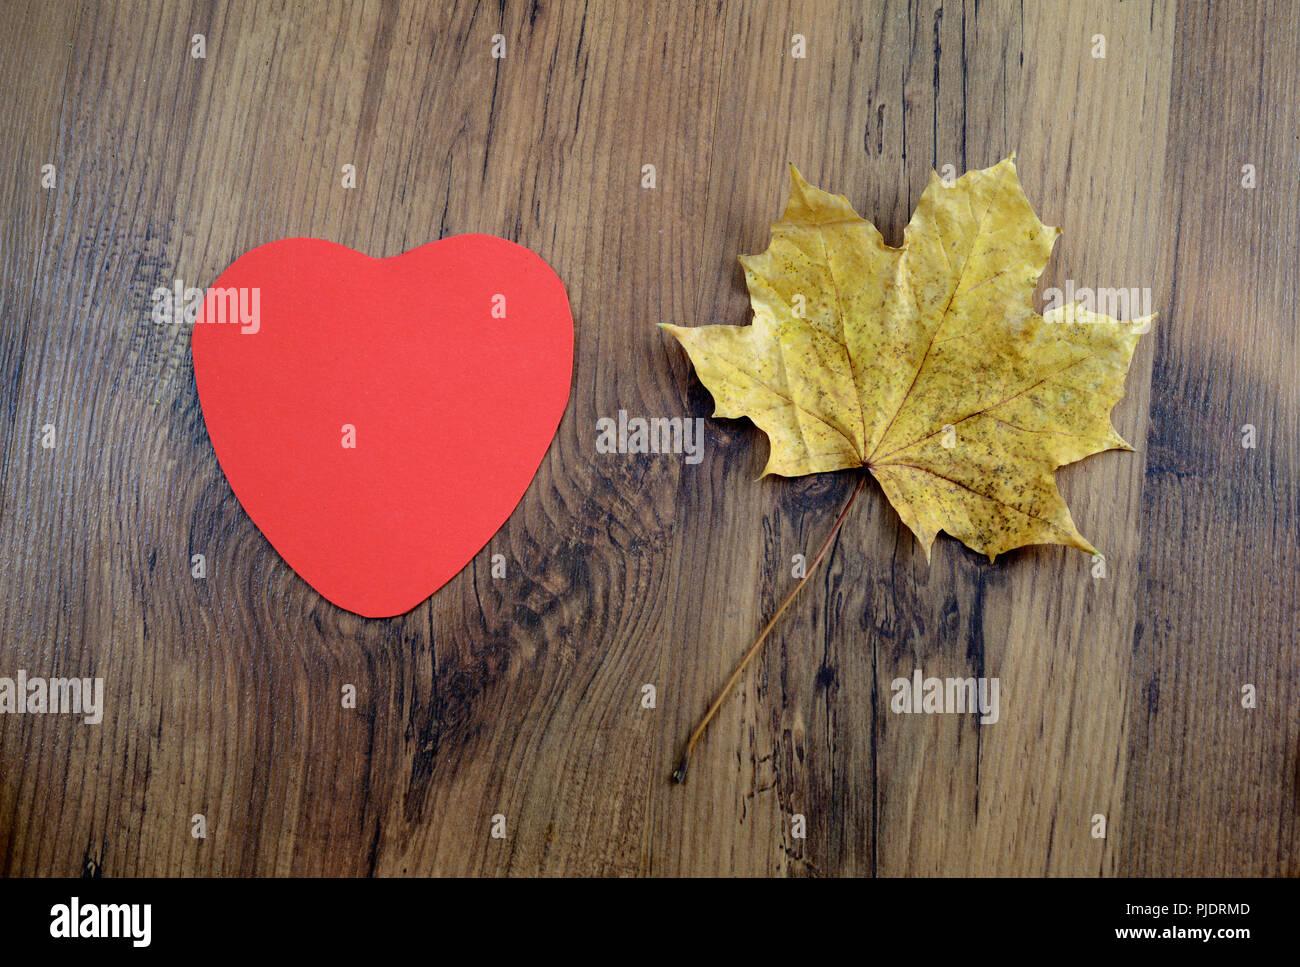 Herbst Basteln Stockfotos Herbst Basteln Bilder Alamy